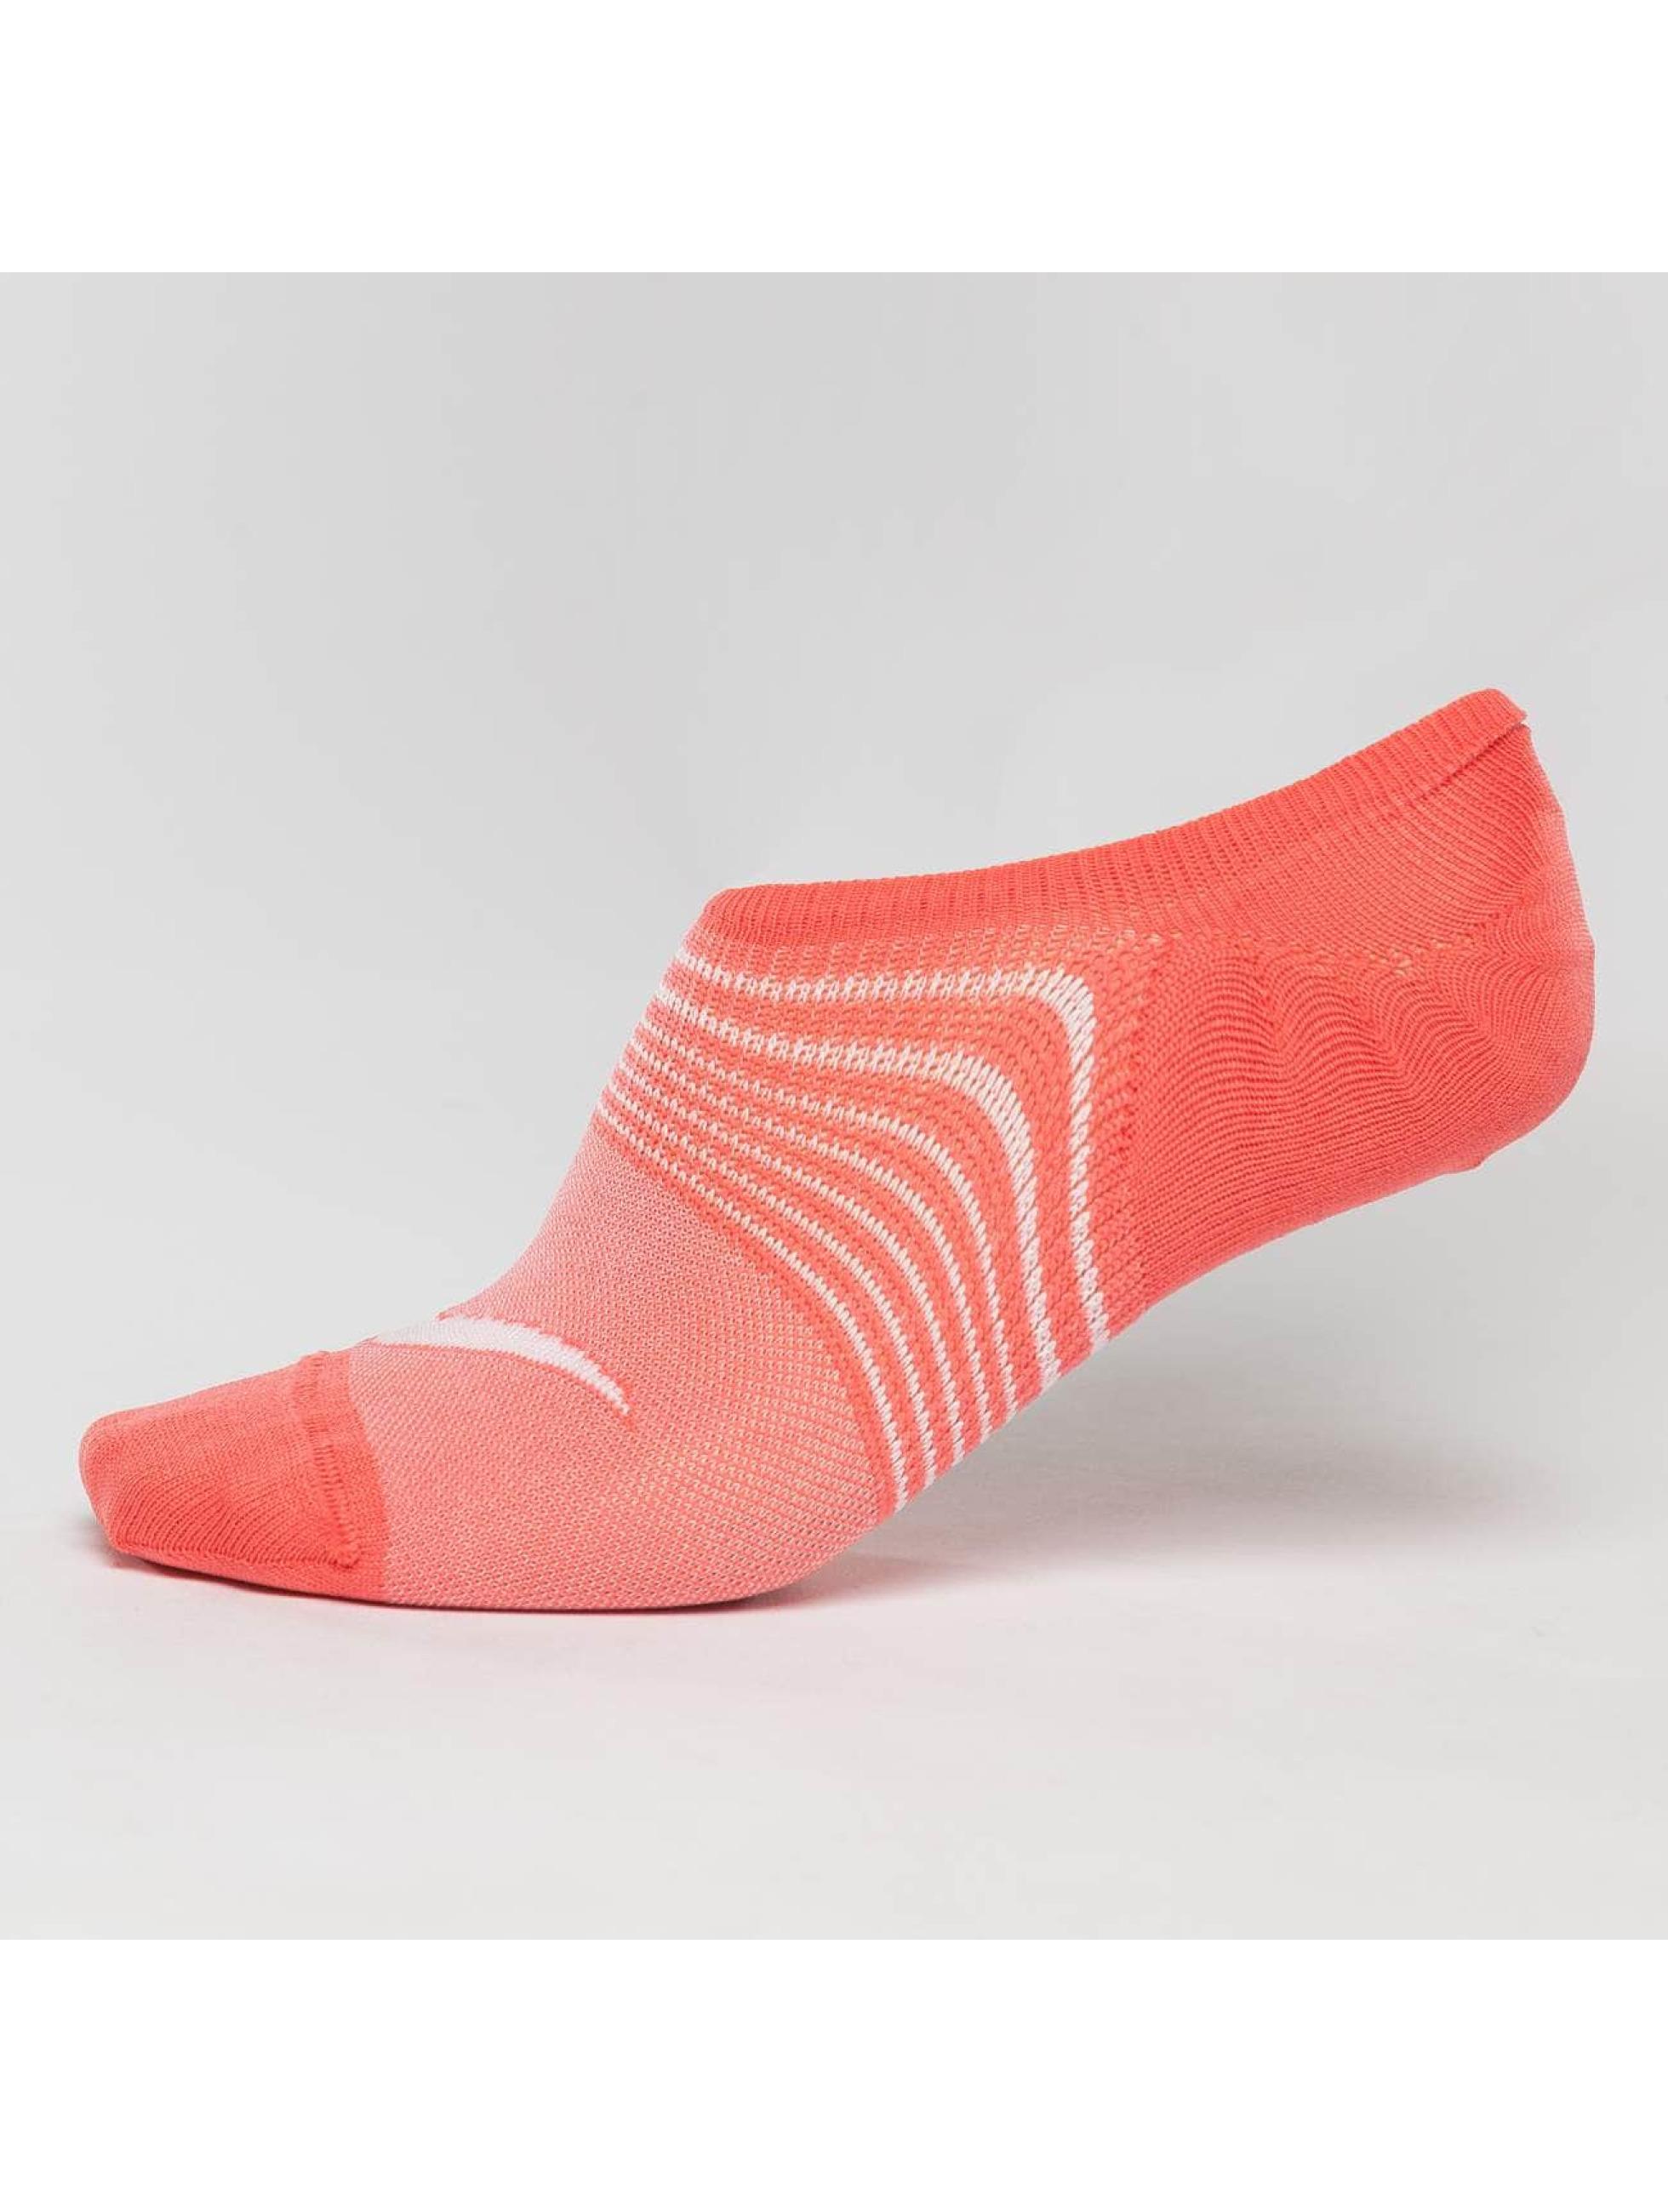 Nike Performance Chaussettes Everyday Plus Lightweight Training 3 Pack Footie orange